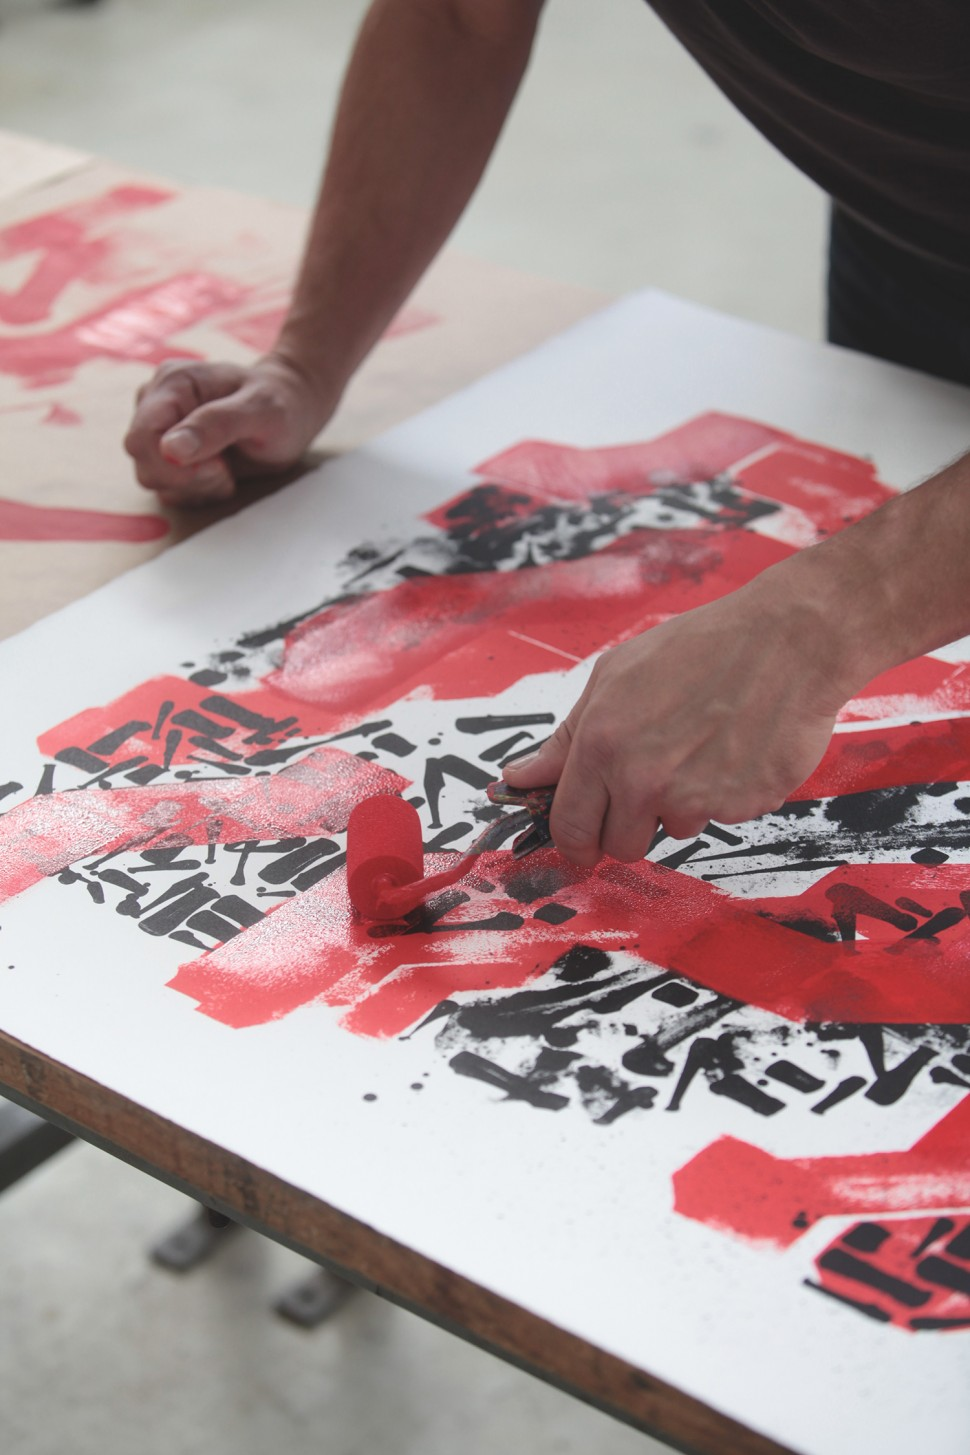 lek_sowat_paper_trail_lithographie_DMV_da_mental_vaporz_stone_film_urdla_graffiti_print_fine_art_paris_soldart_traditional_culture_calame_calligraphy_edition_royx_nicolas_royol_DJL